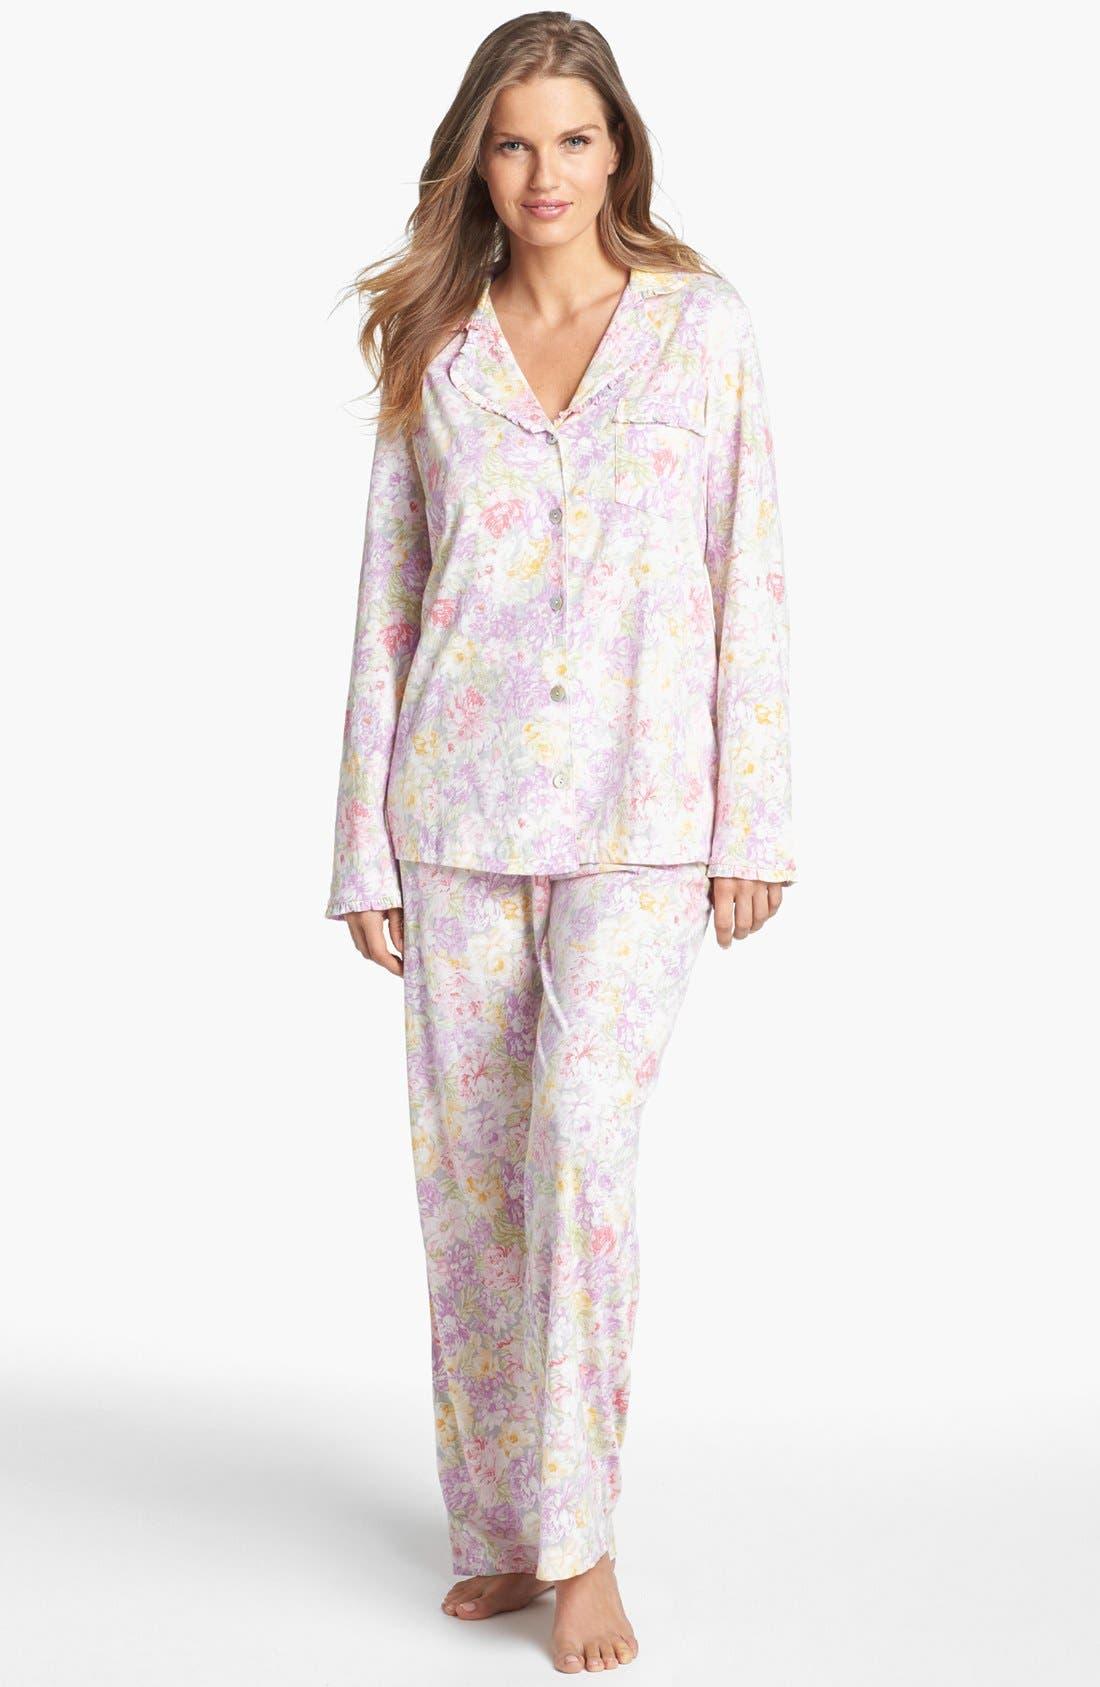 Alternate Image 1 Selected - Carole Hochman Designs 'Garden Arrangement' Pajamas